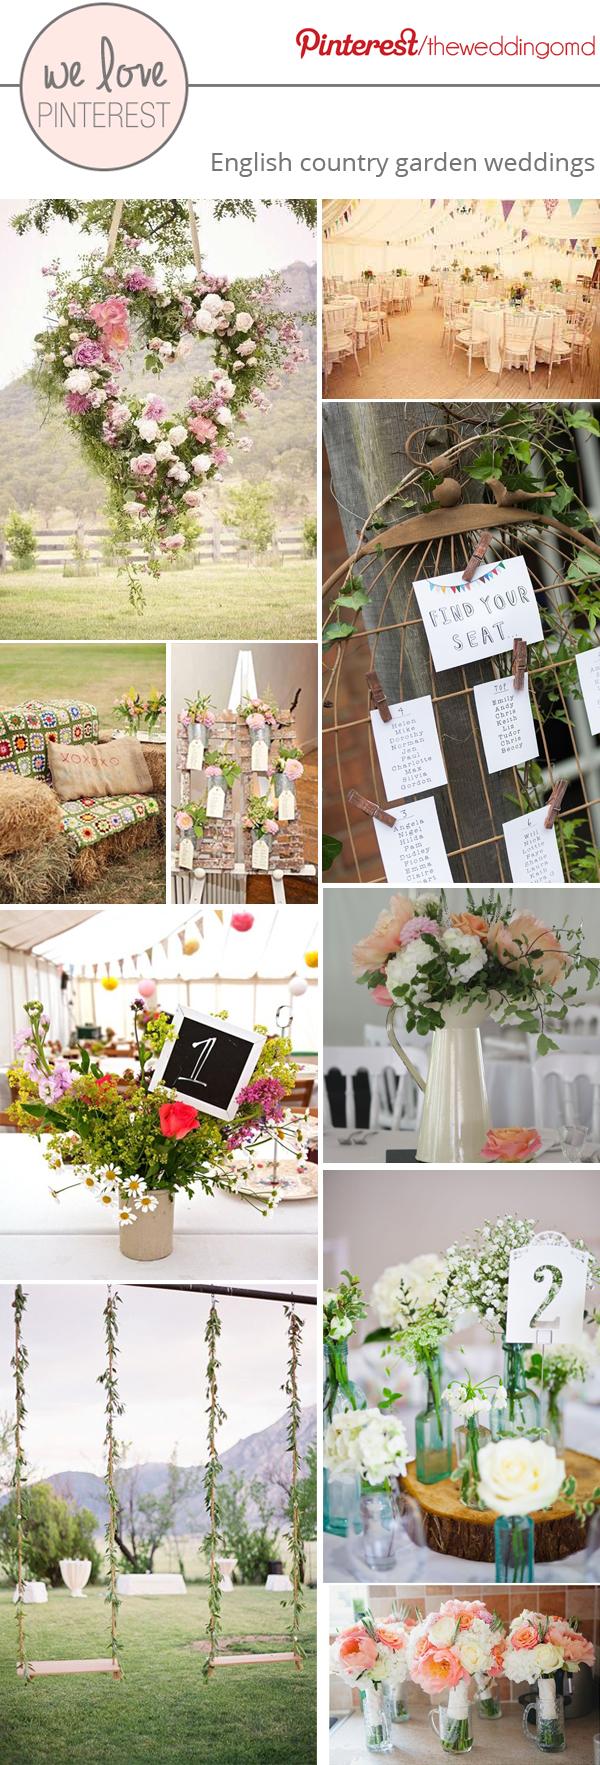 english country garden decorations & wedding ideas